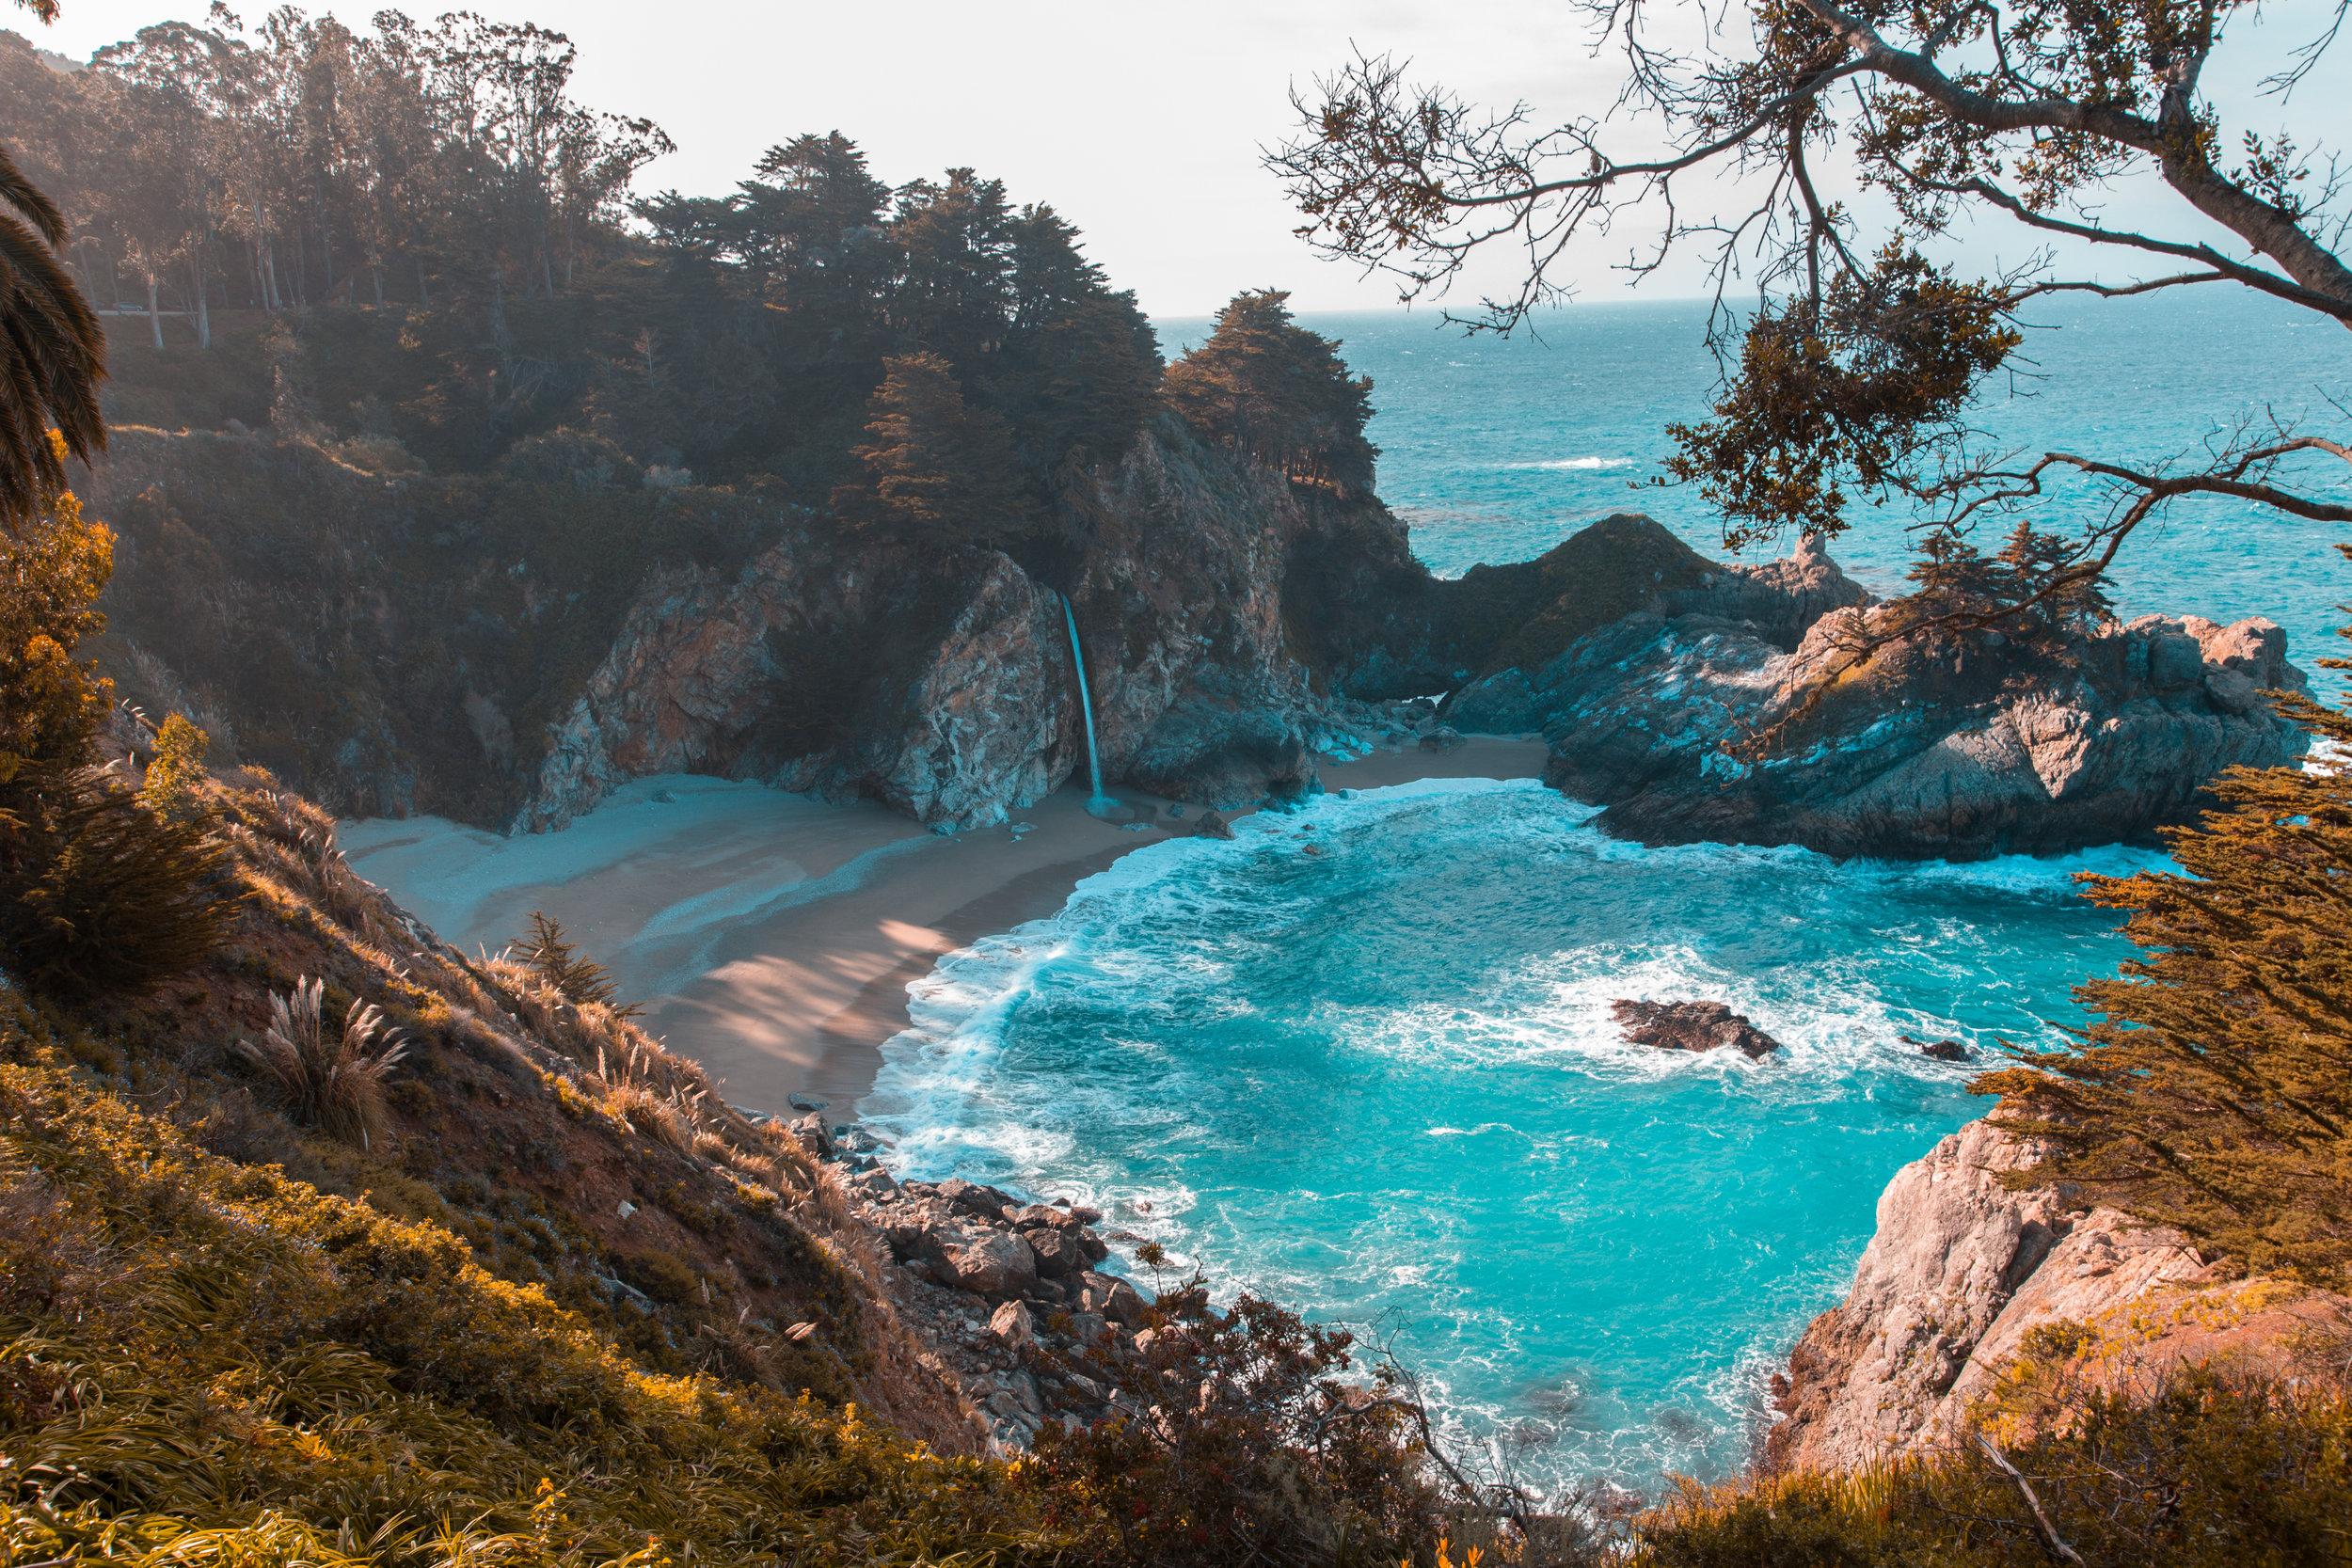 CALIFORNIA - TRAVEL GUIDE